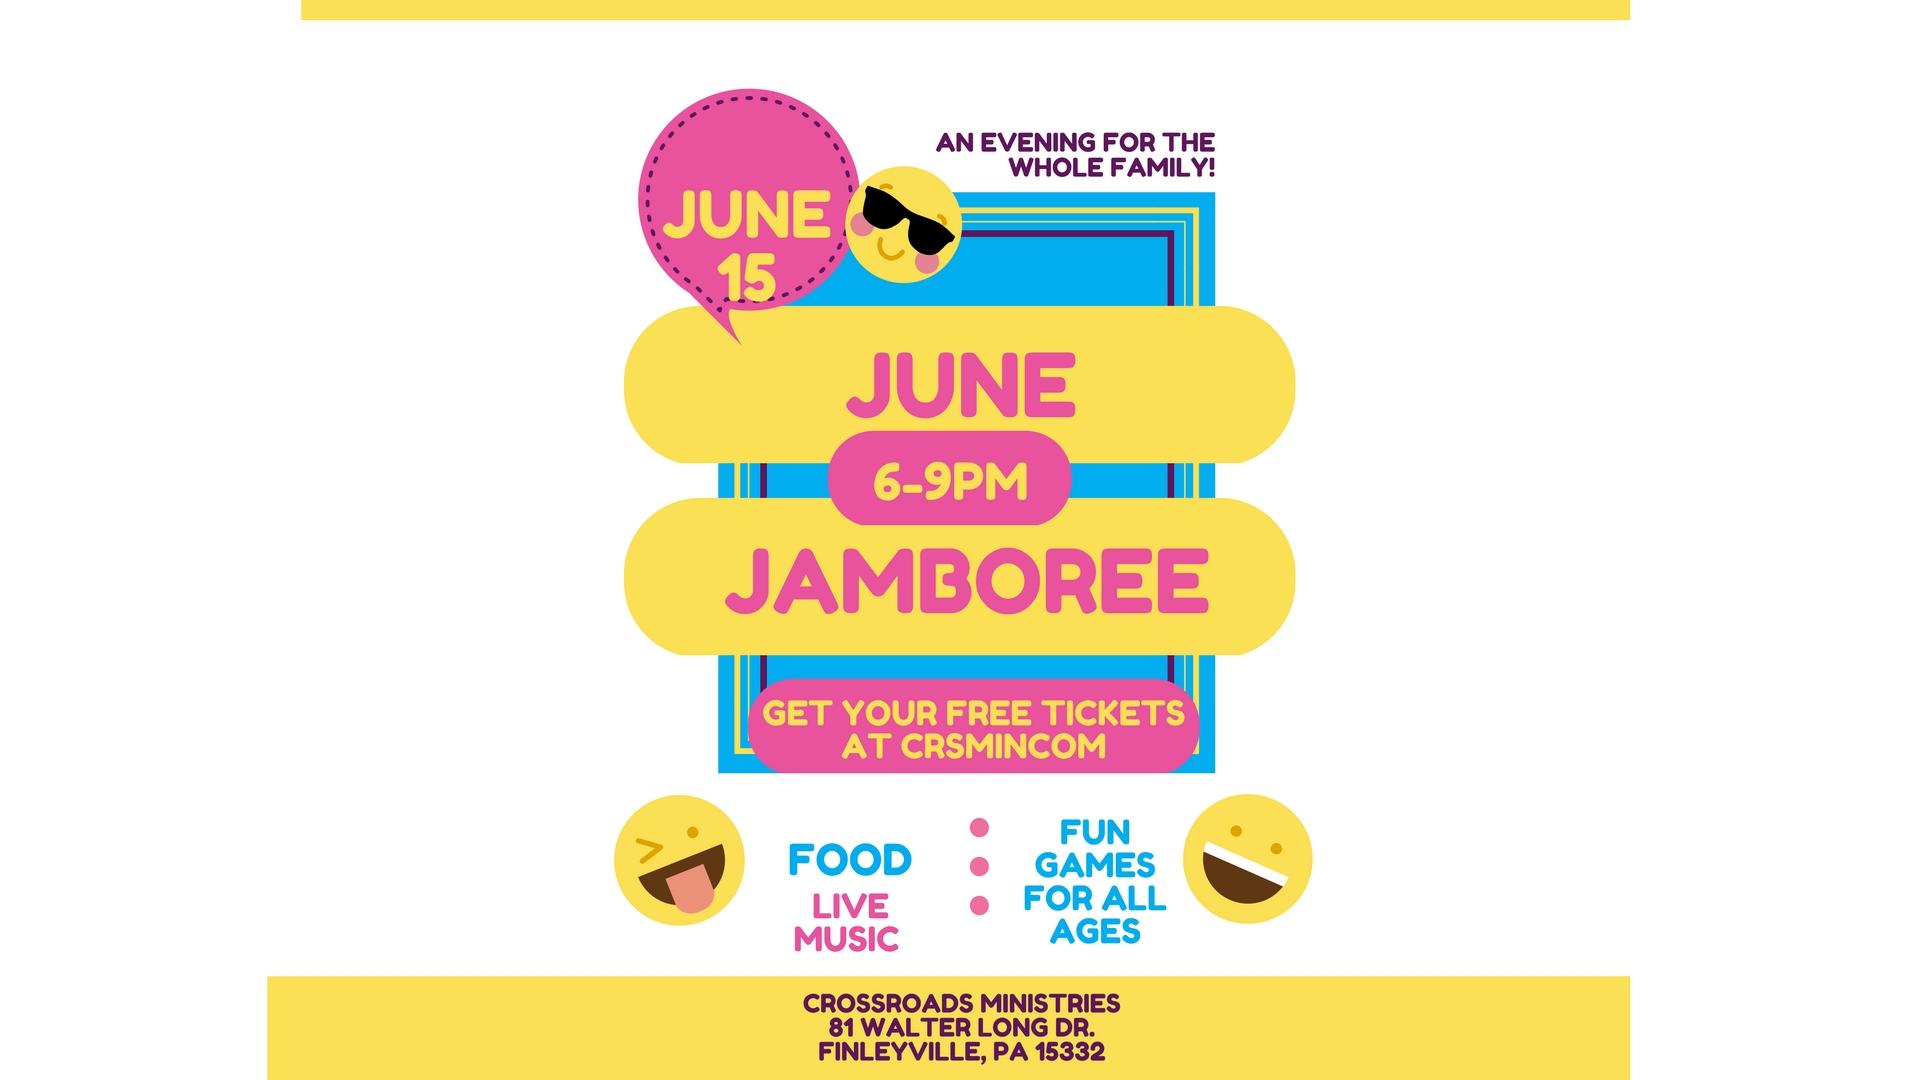 June Jamboree 2018 @ Crossroads Ministries on June 15